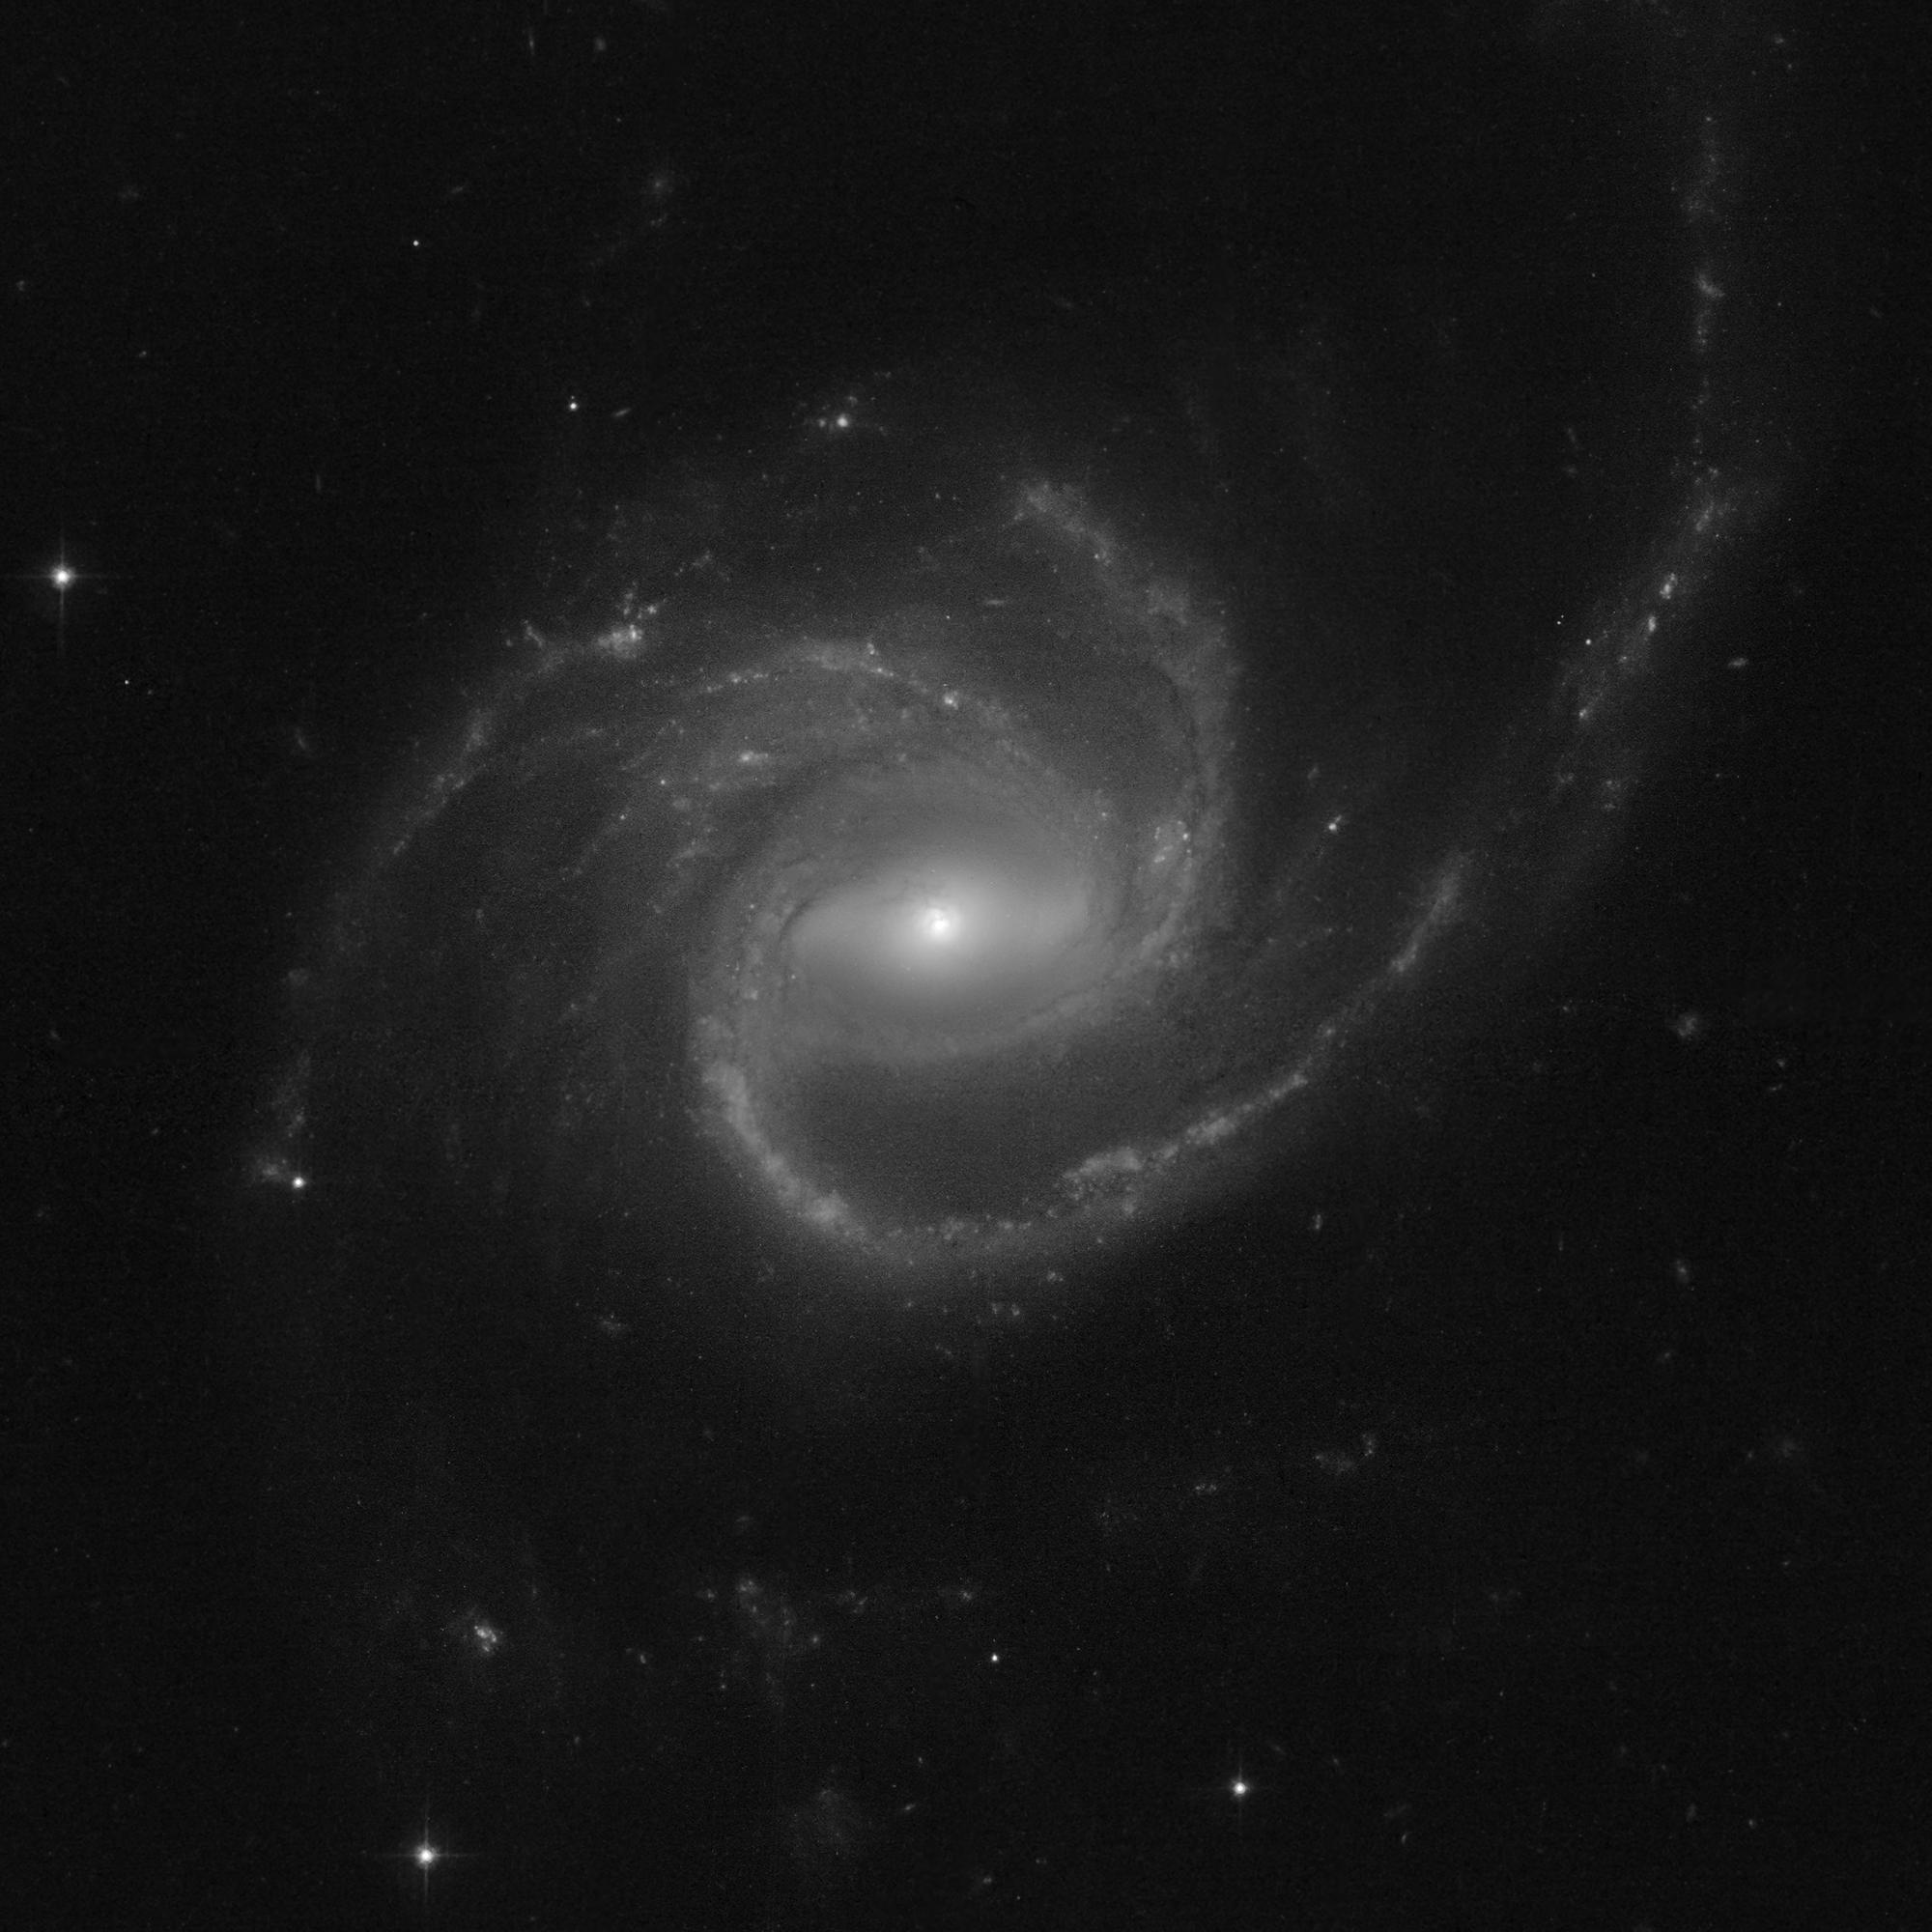 spiral galaxy ARP-MADORE0002-503